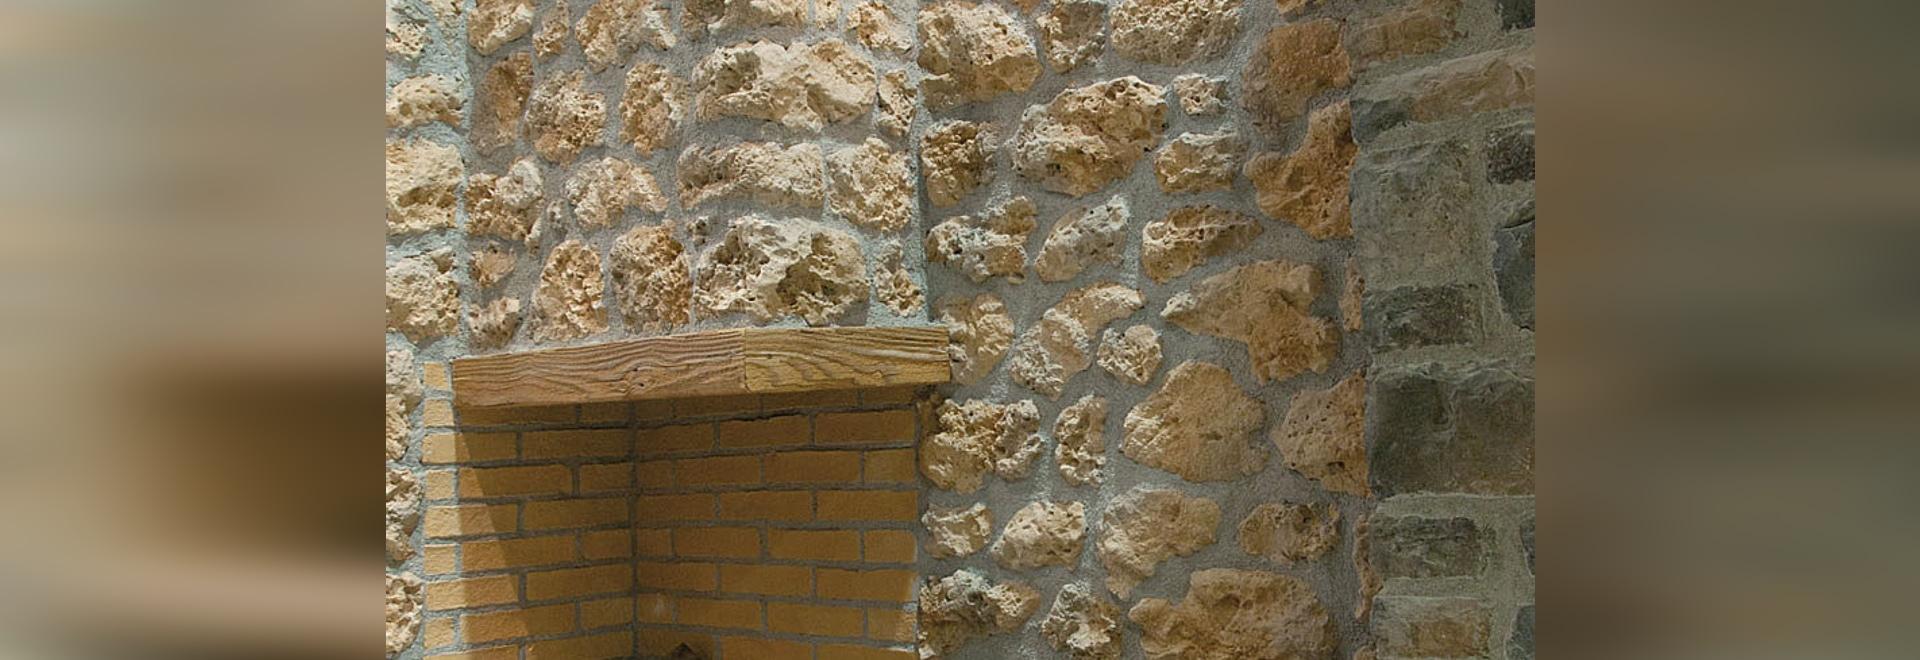 New wall covering Timanfaya